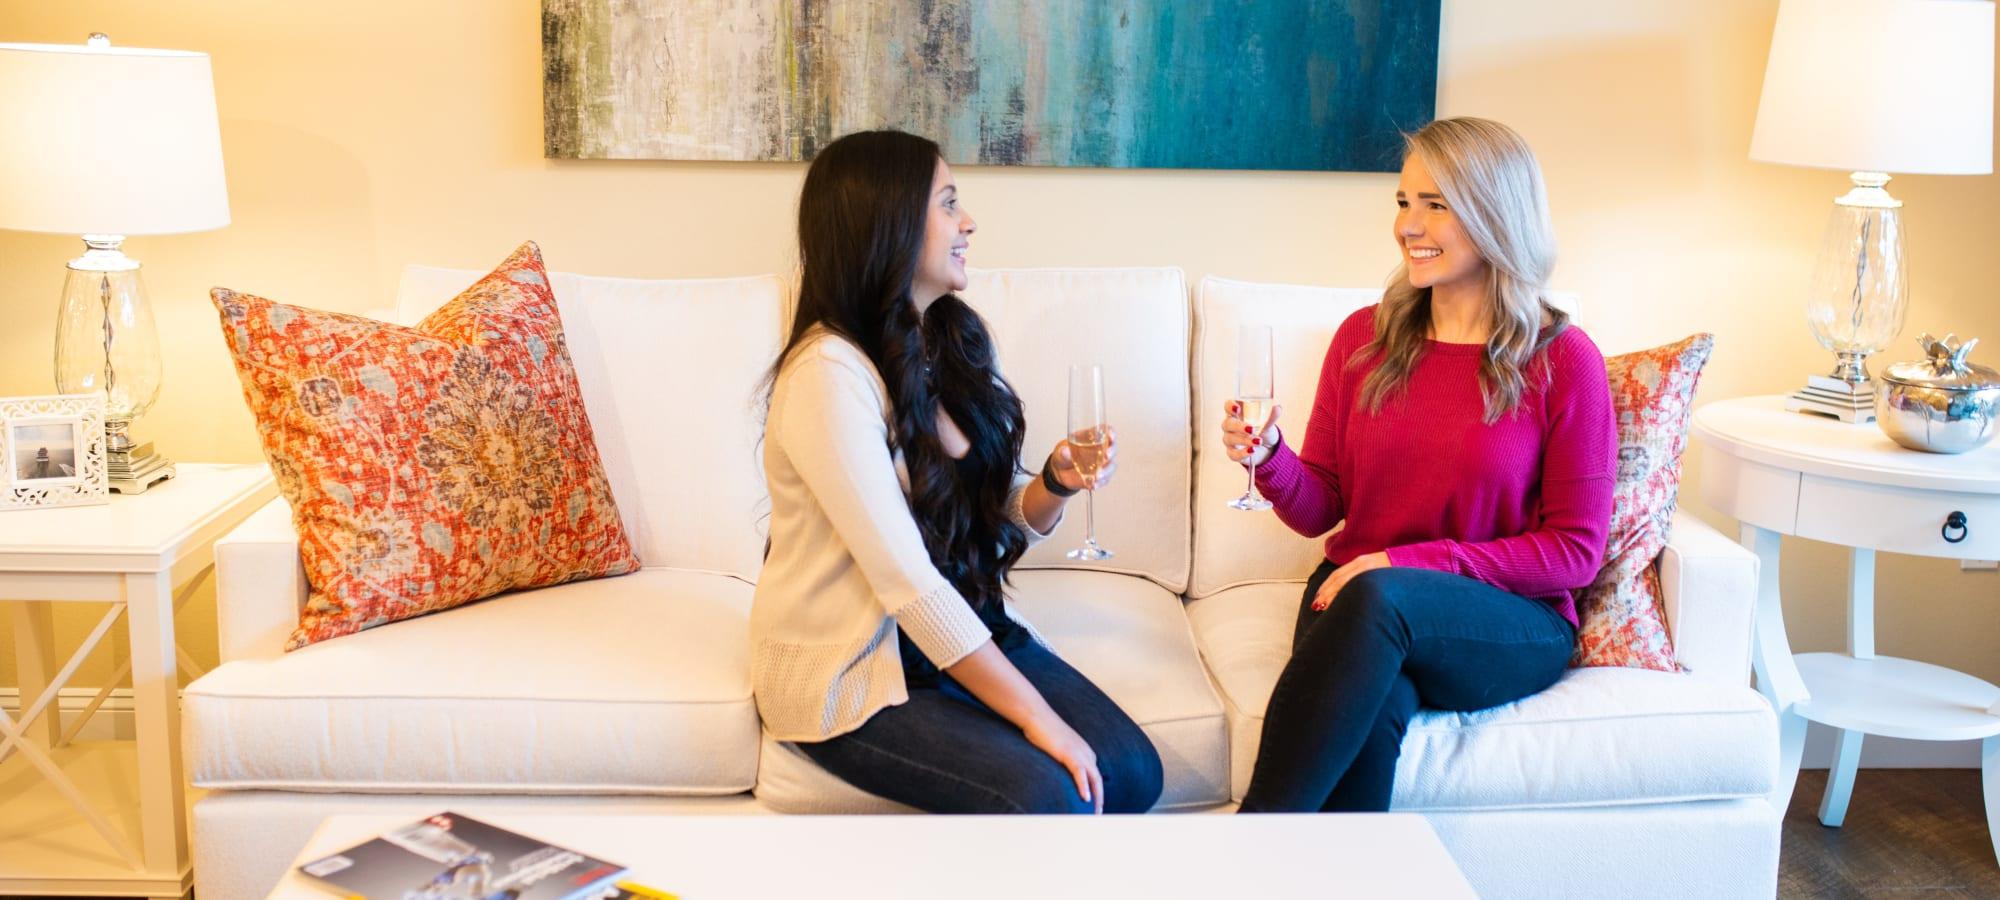 Spacious living room in model home at Villa Vita Apartments in Peoria, Arizona